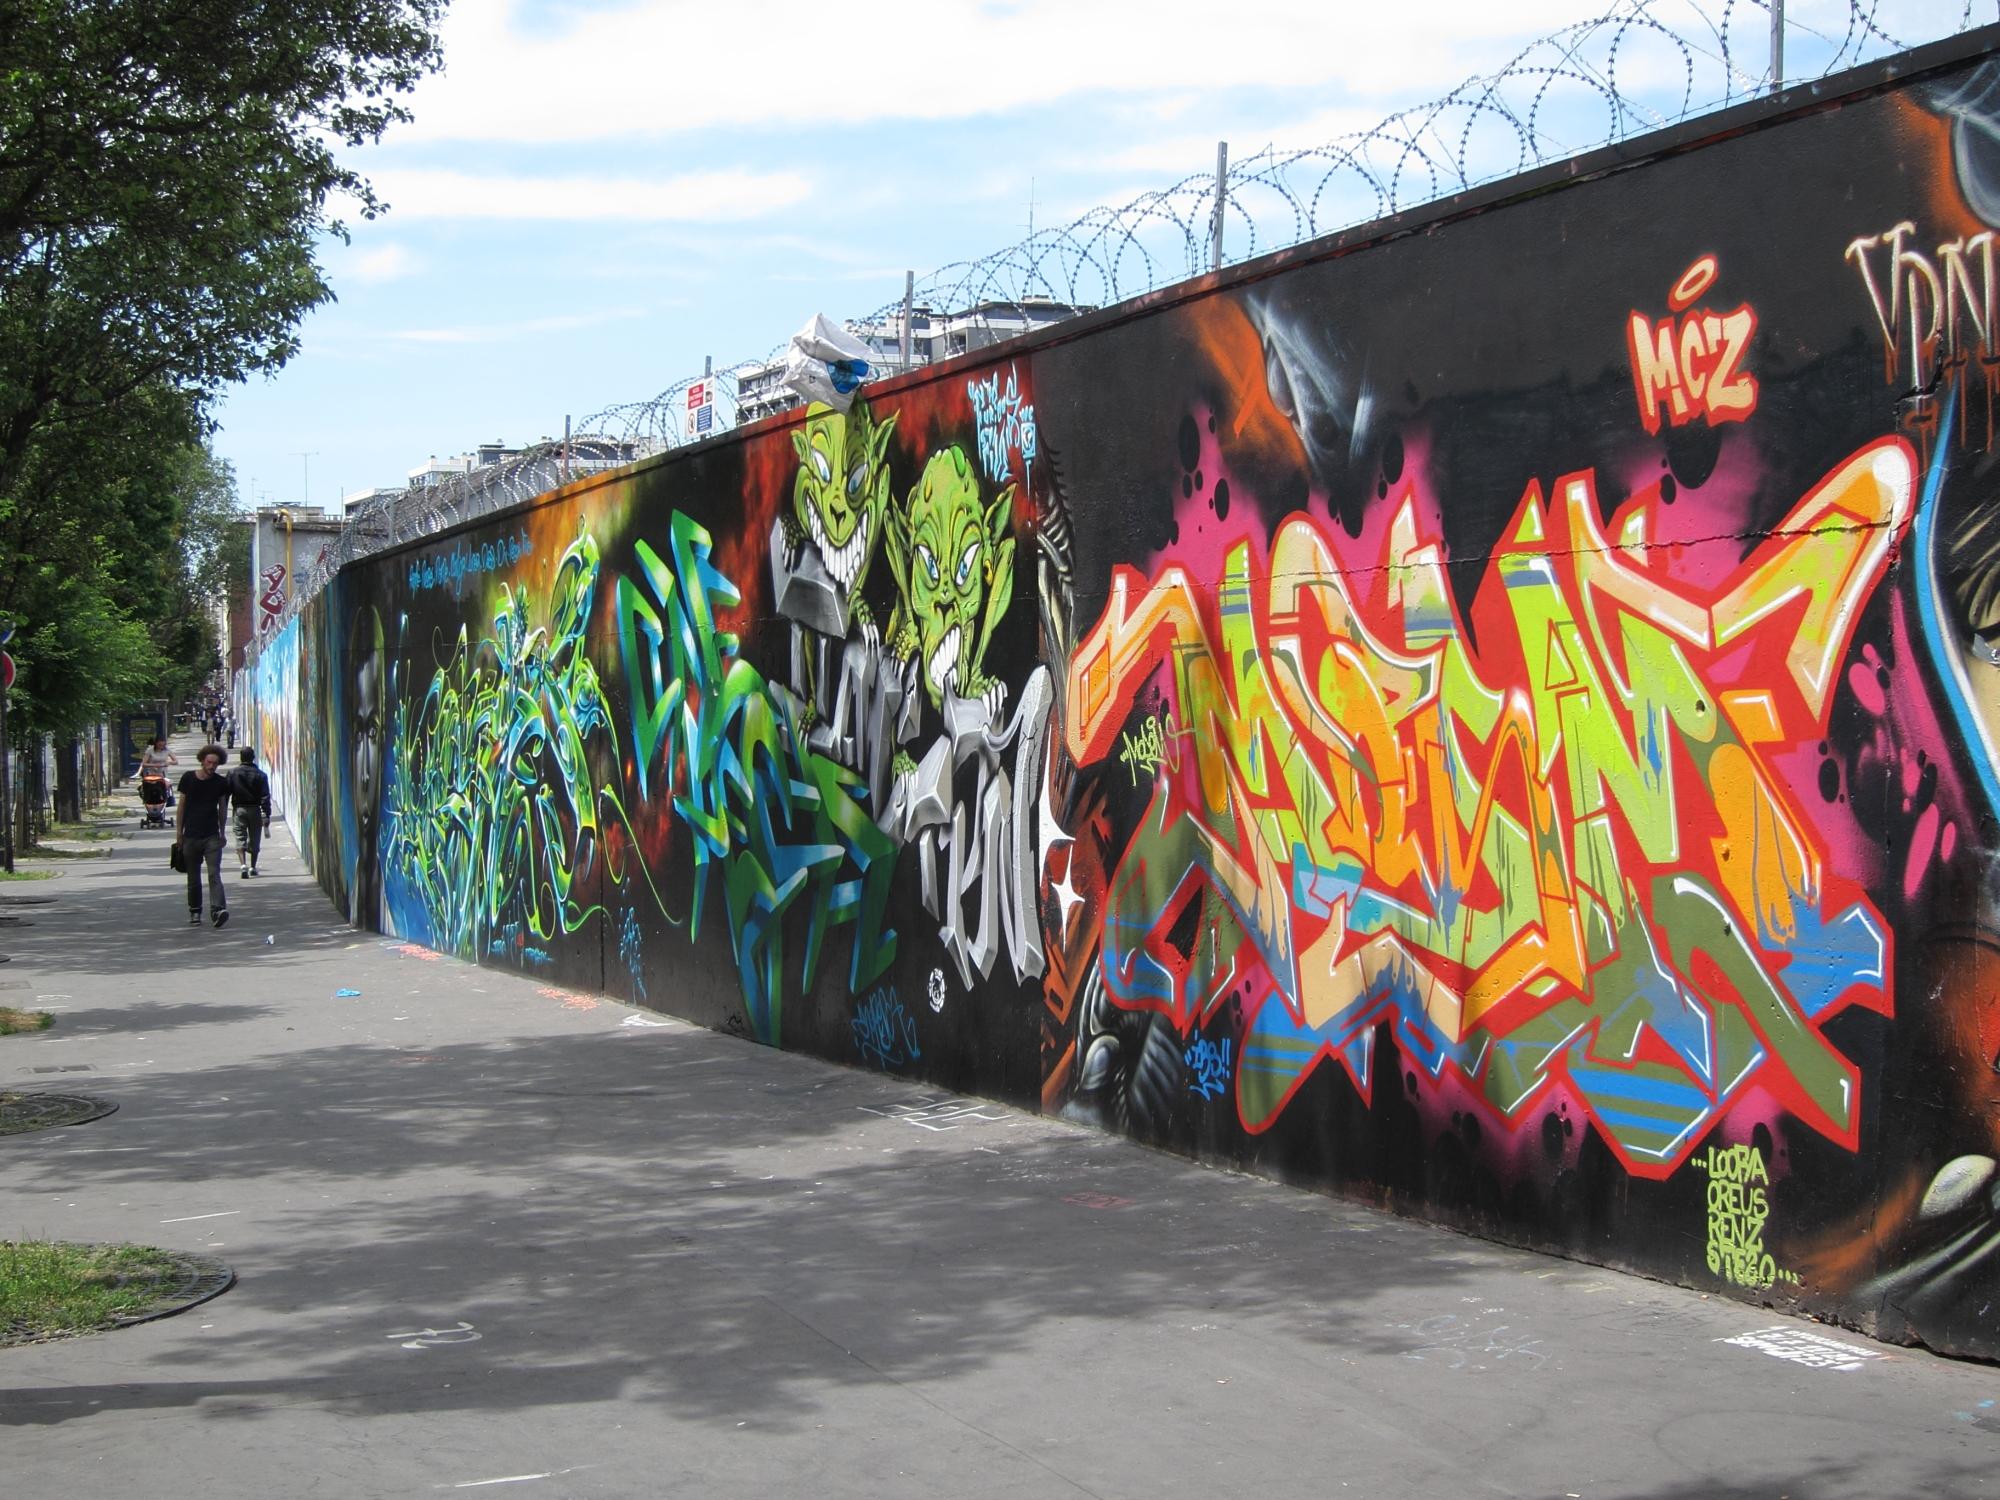 Street art on a wall along the rue Ordener in Paris.